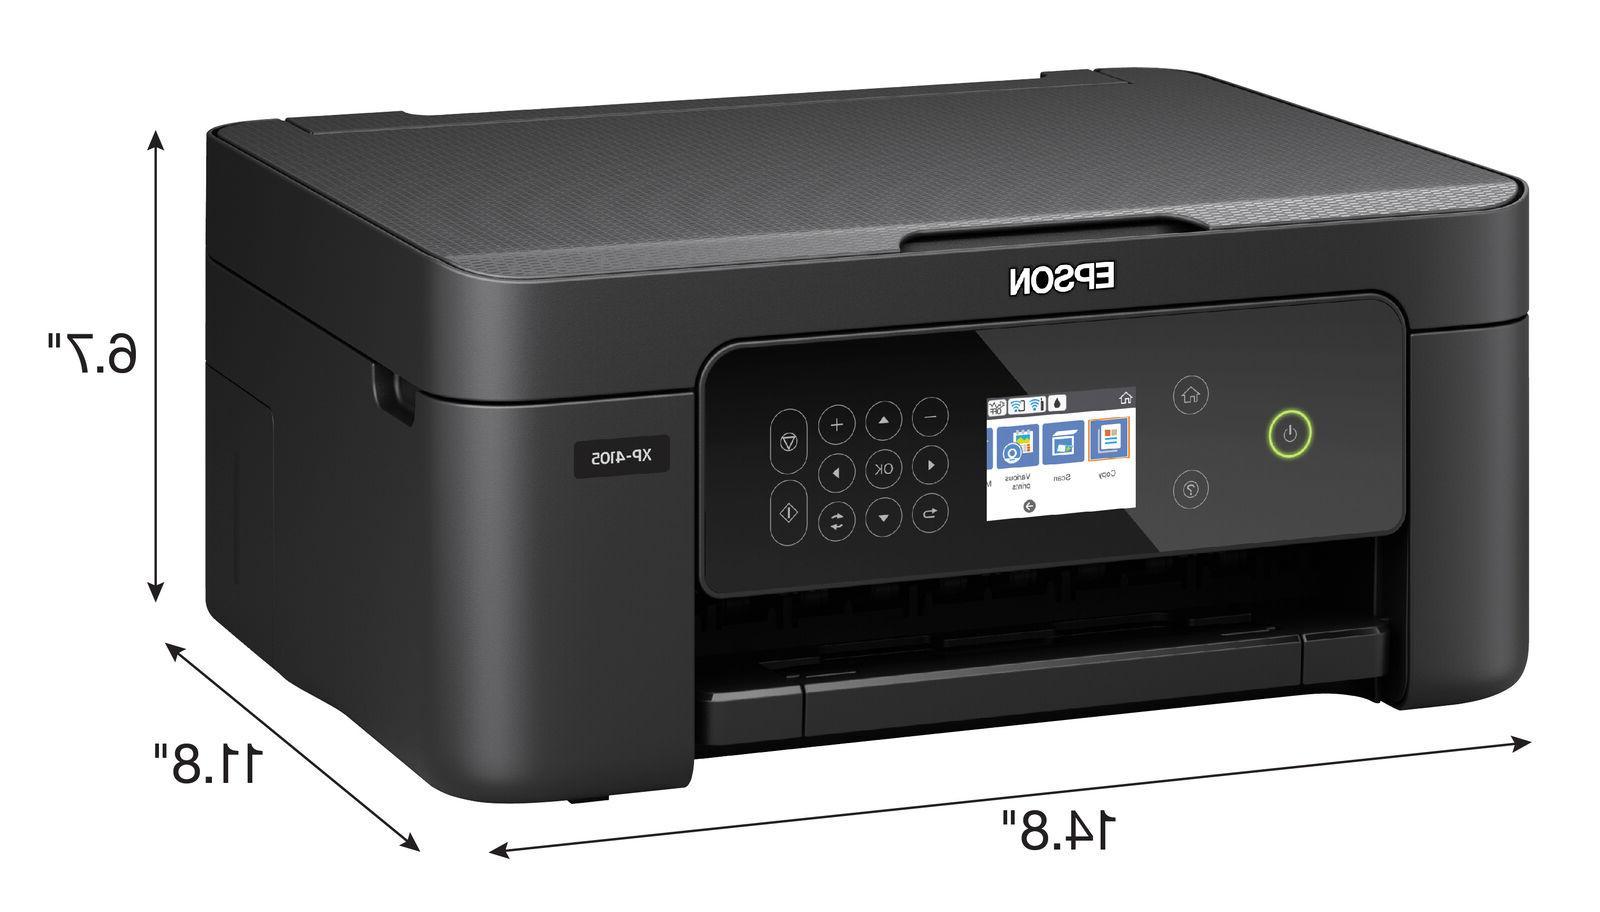 Epson Printer Machine Copier Office Wi-Fi With INK